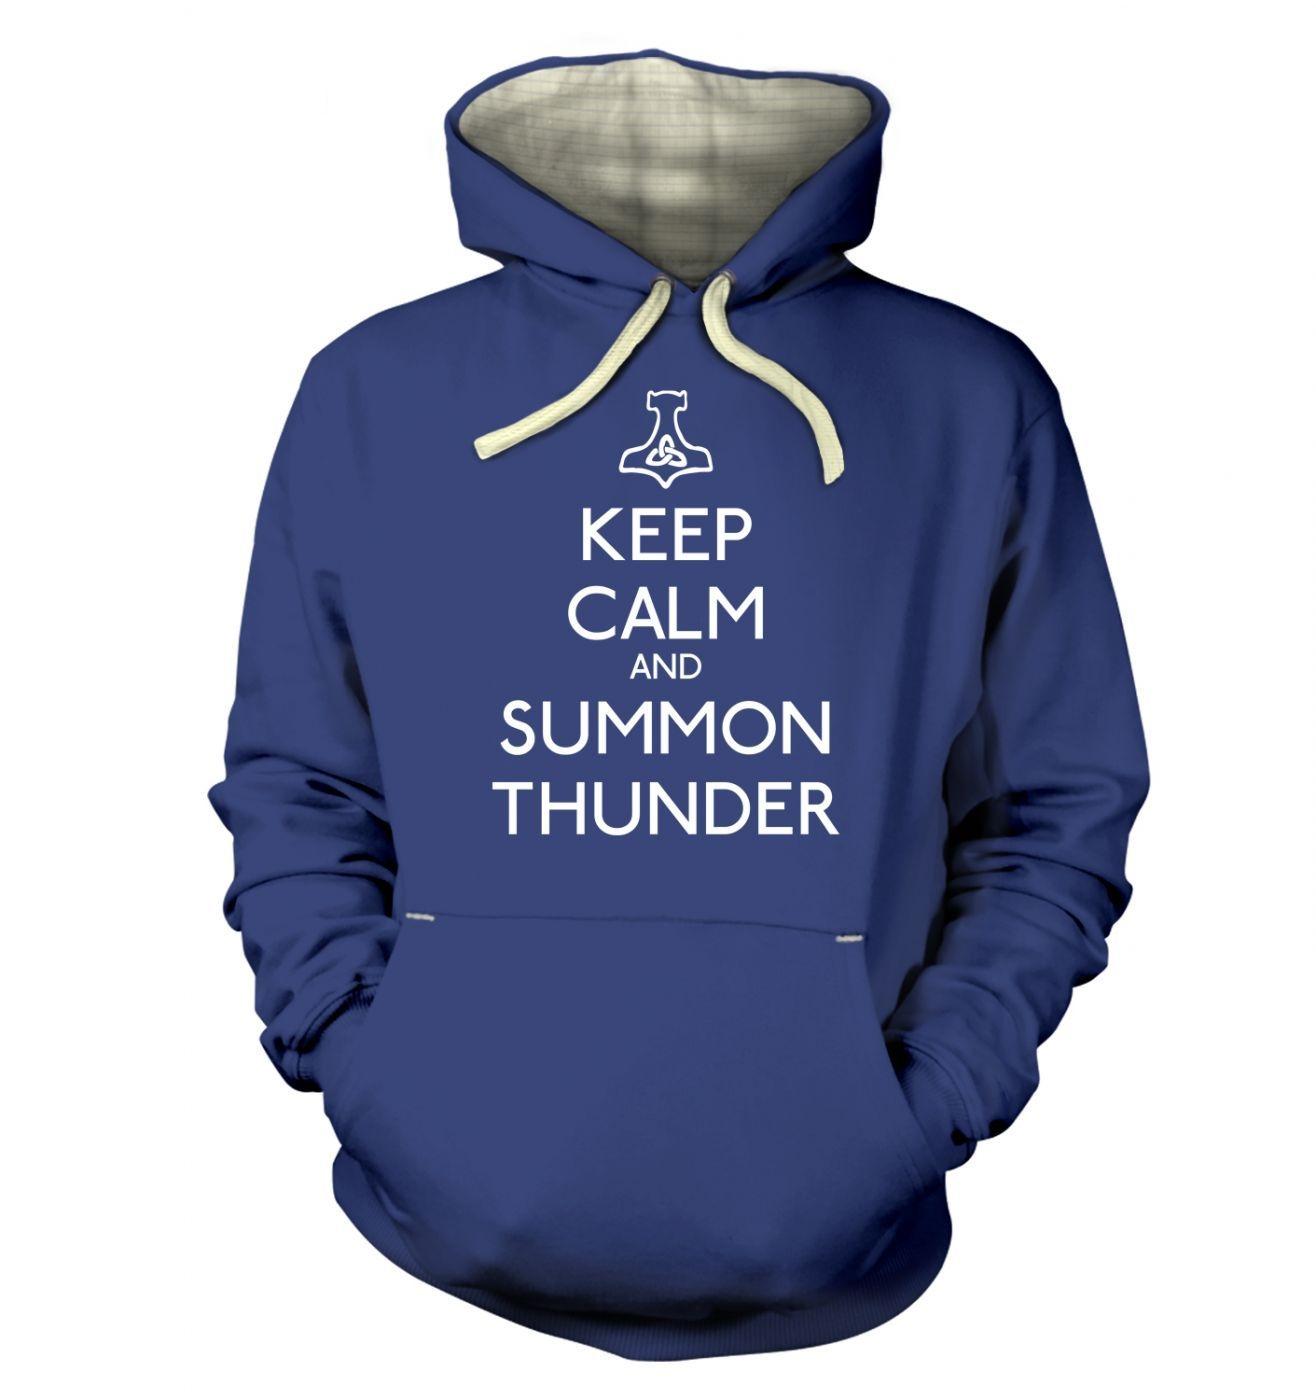 Keep Calm and Summon Thunder premium hoodie